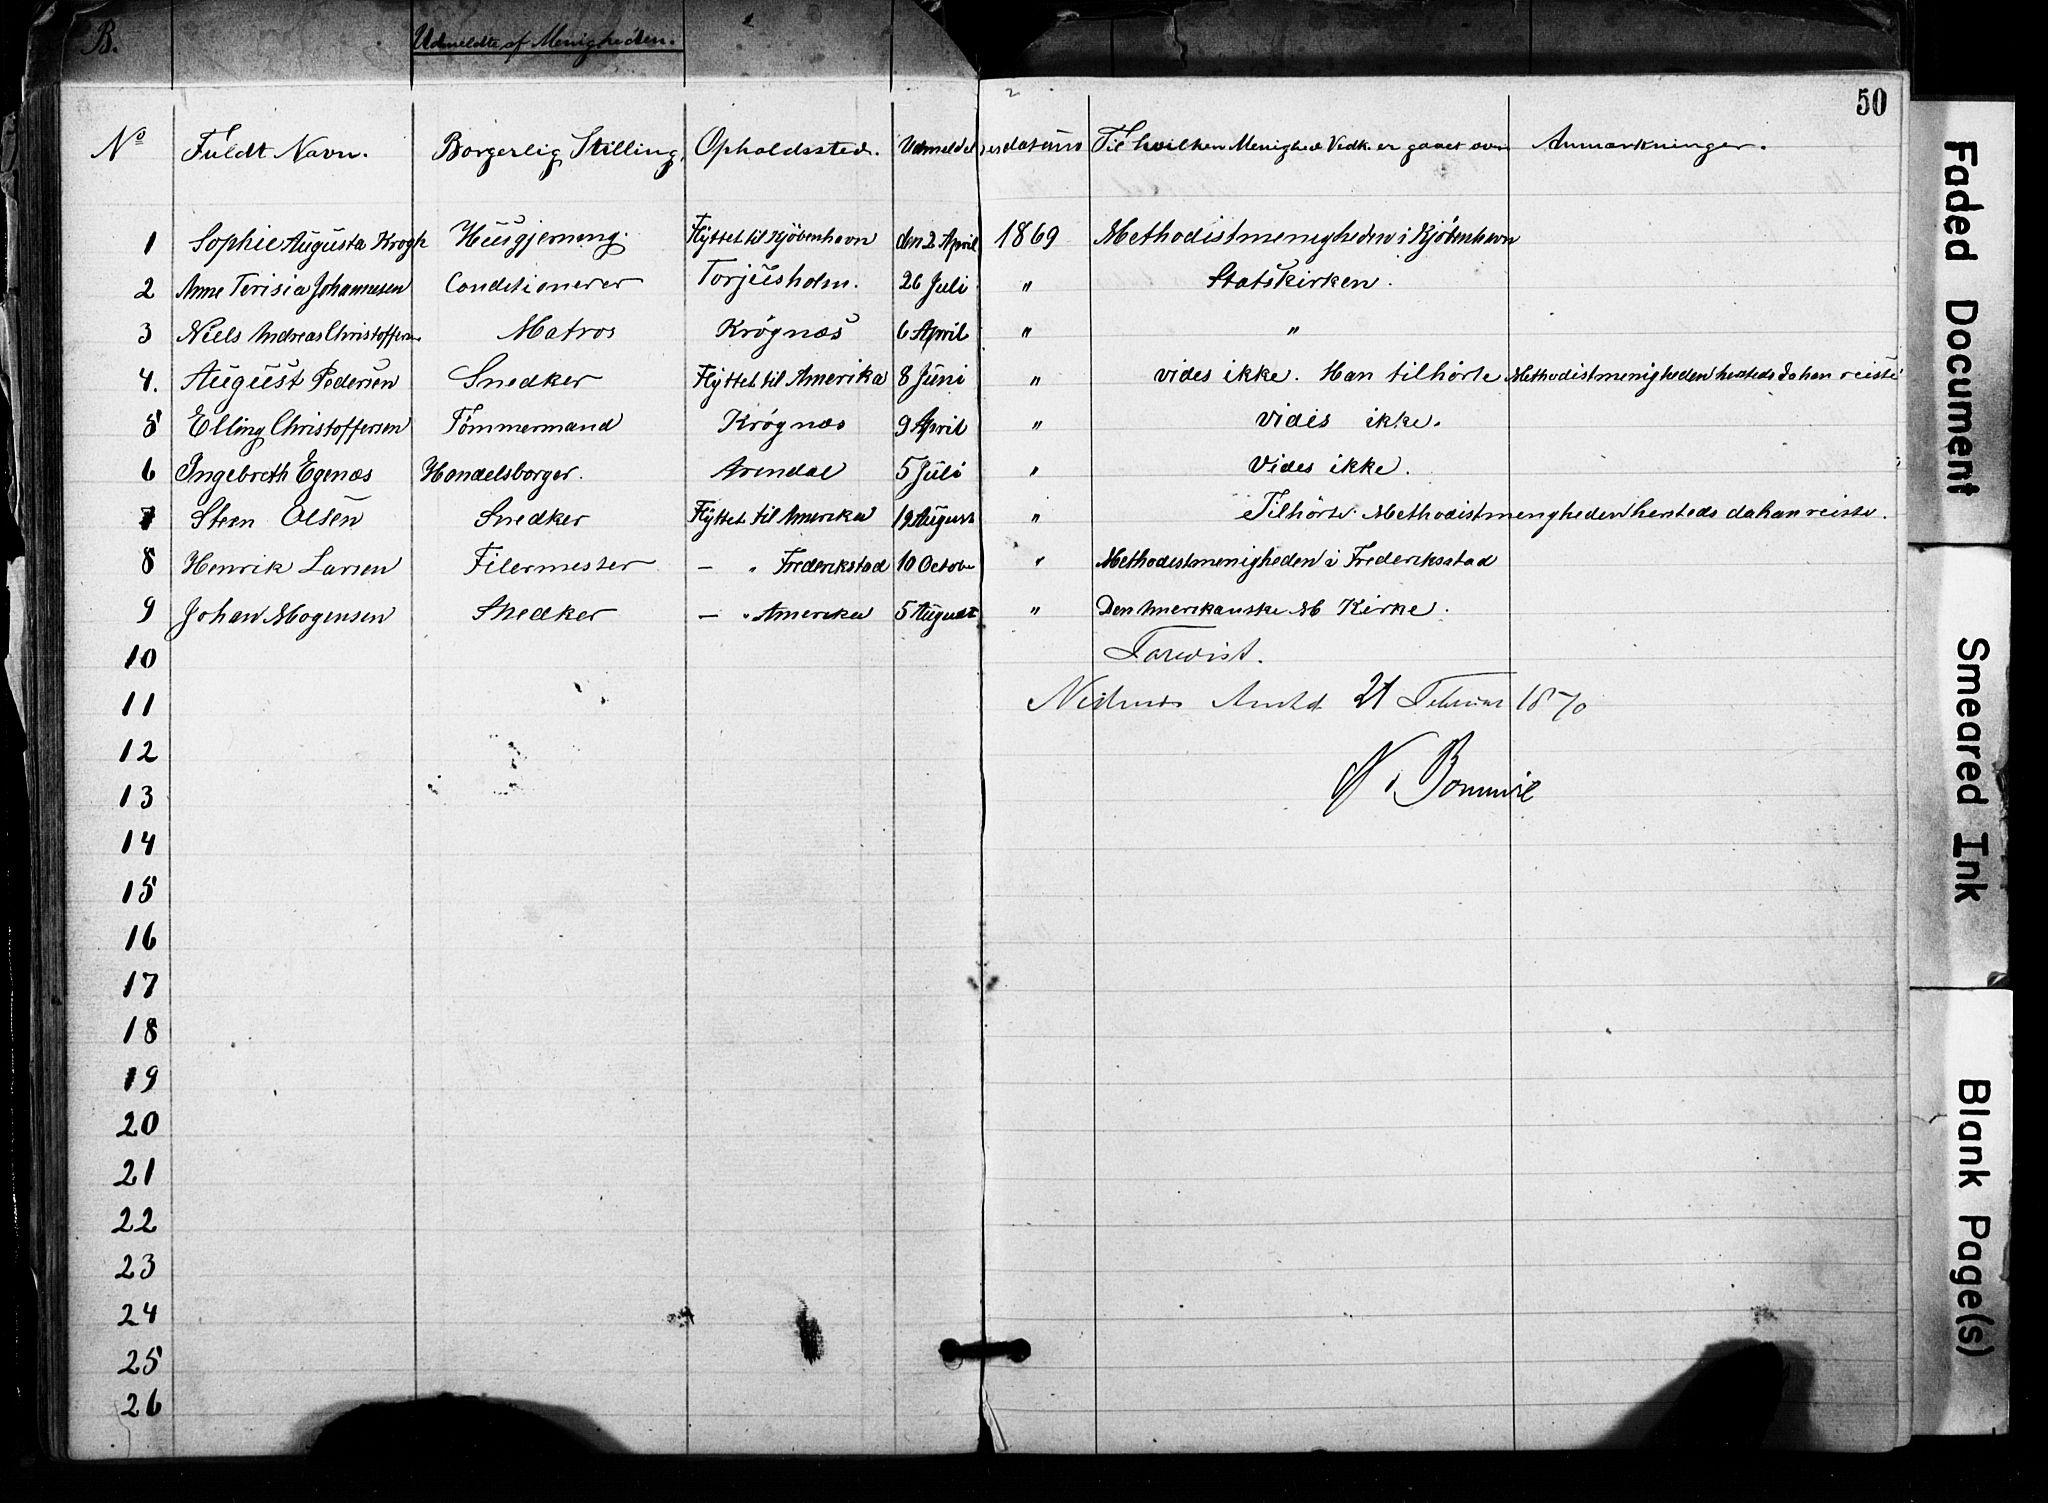 SAK, Metodistmenigheten, Arendal, F/Fa/L0001: Dissenterprotokoll nr. F-2, 1867-1879, s. 50